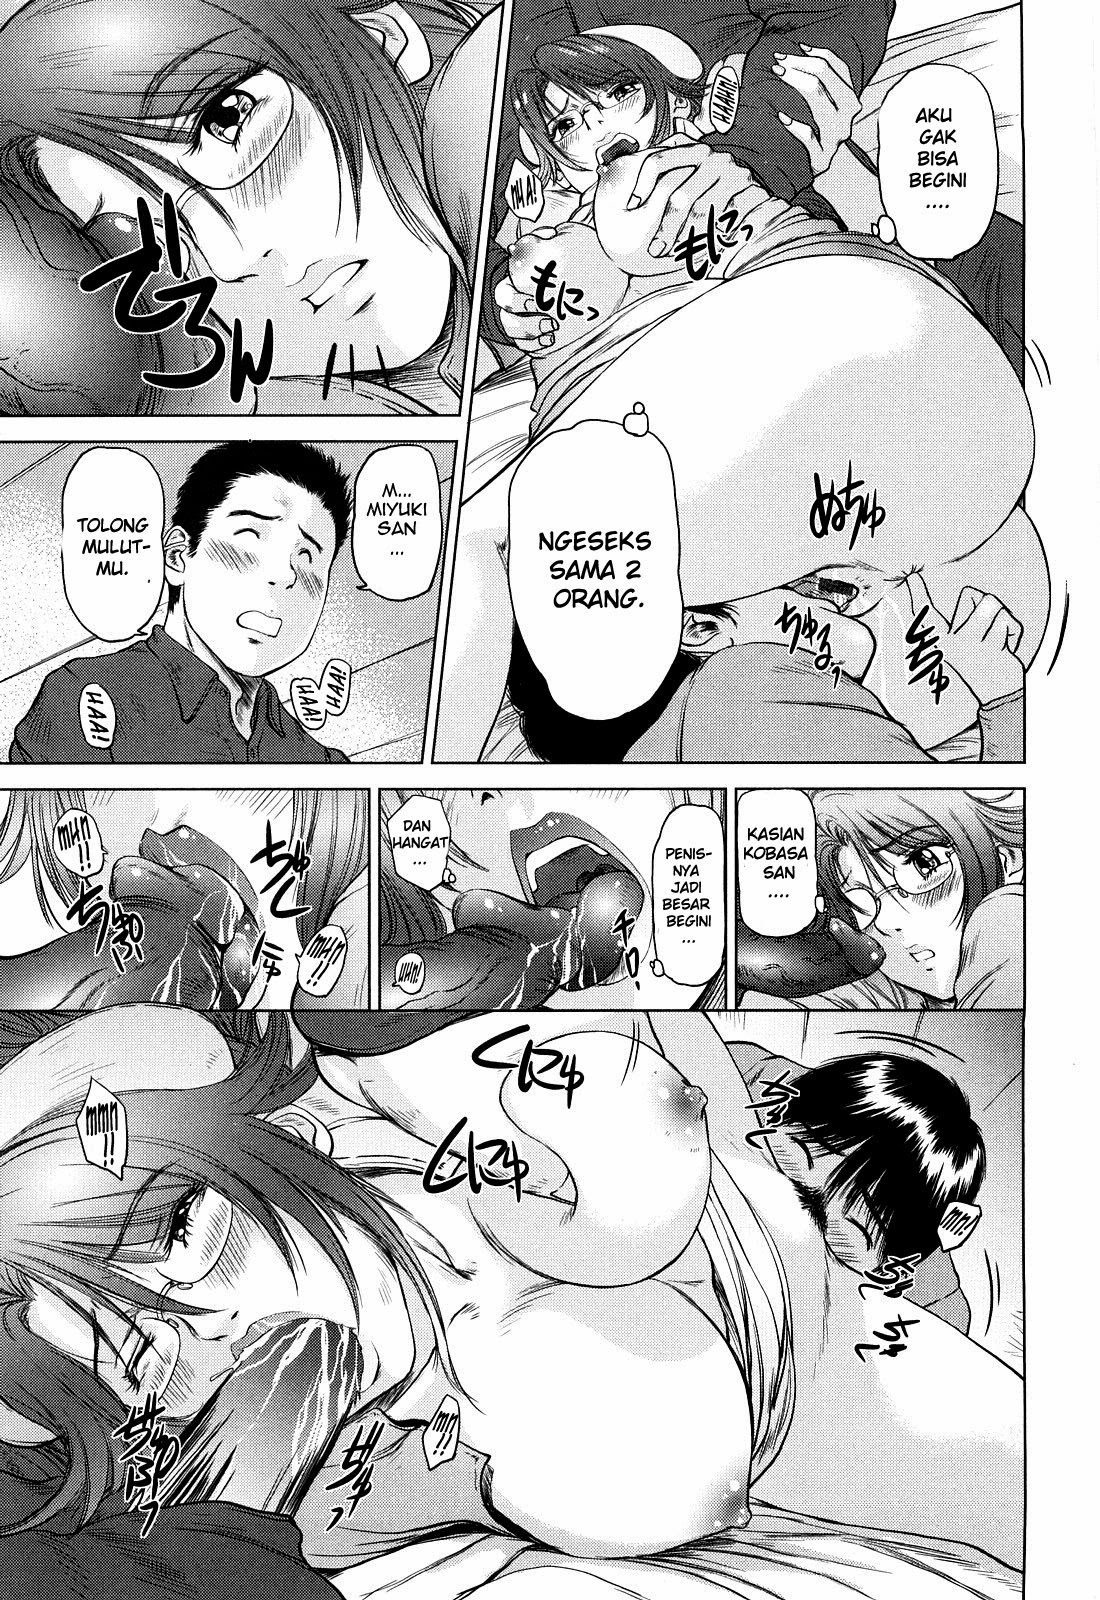 Komik Hentai Suster Semok bikin sange 2 Pasien Manga Sex Porn Doujin XXX Bokep 13